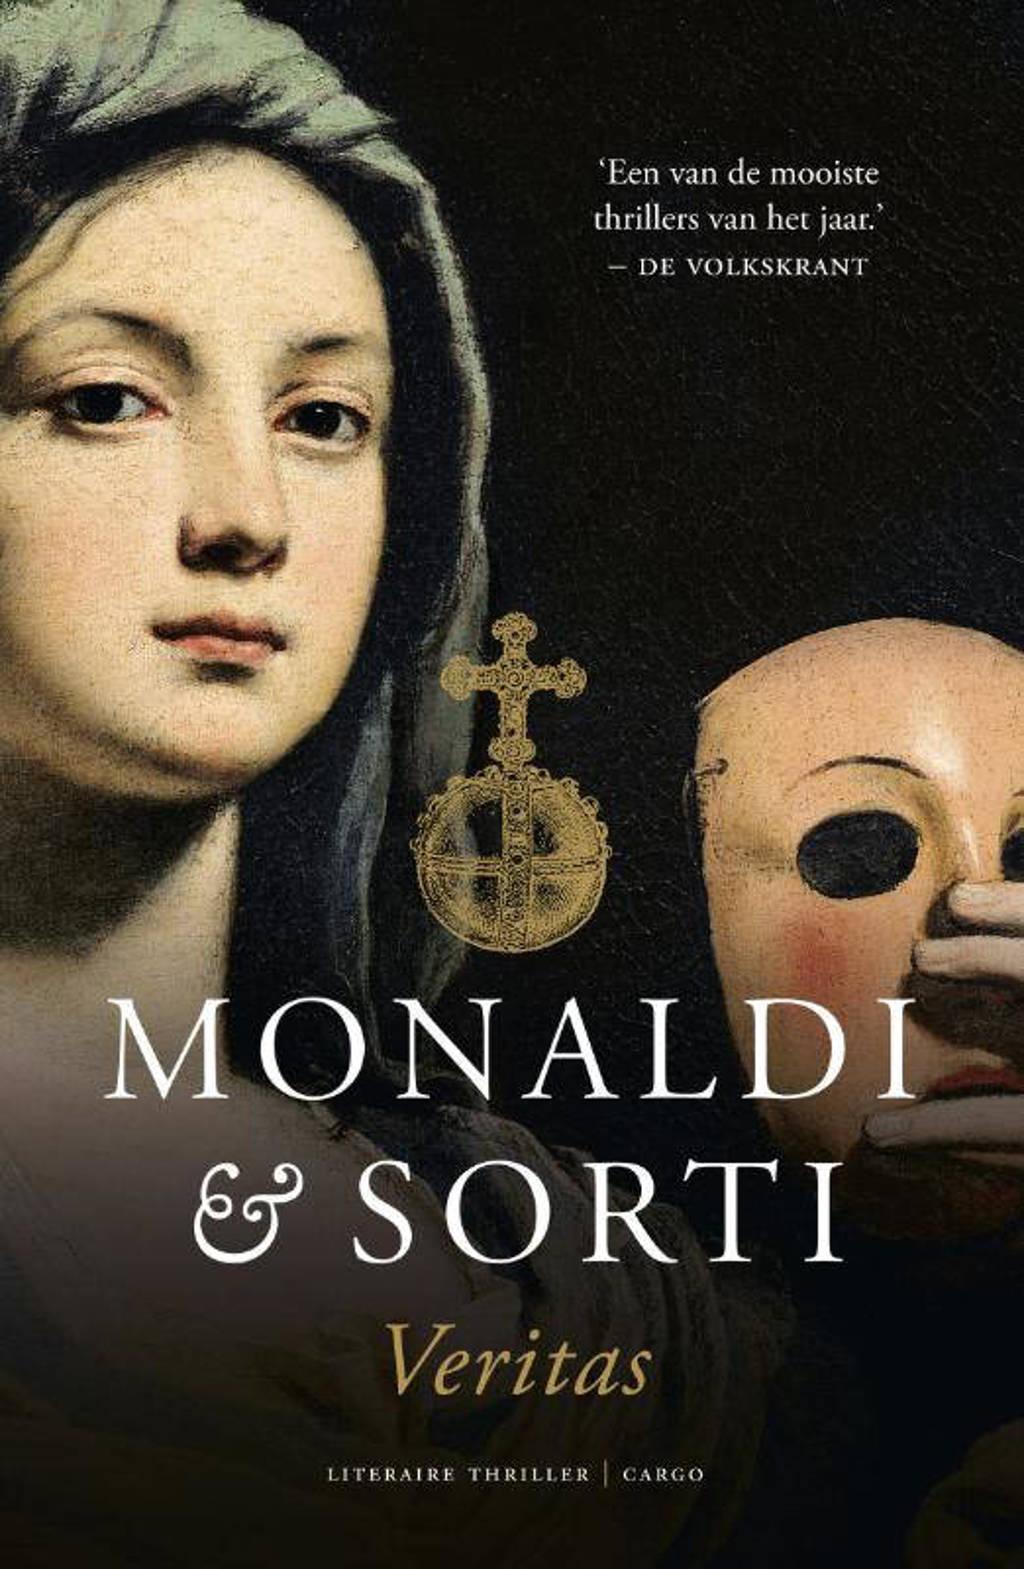 Veritas - Rita Monaldi en Francesco Sorti